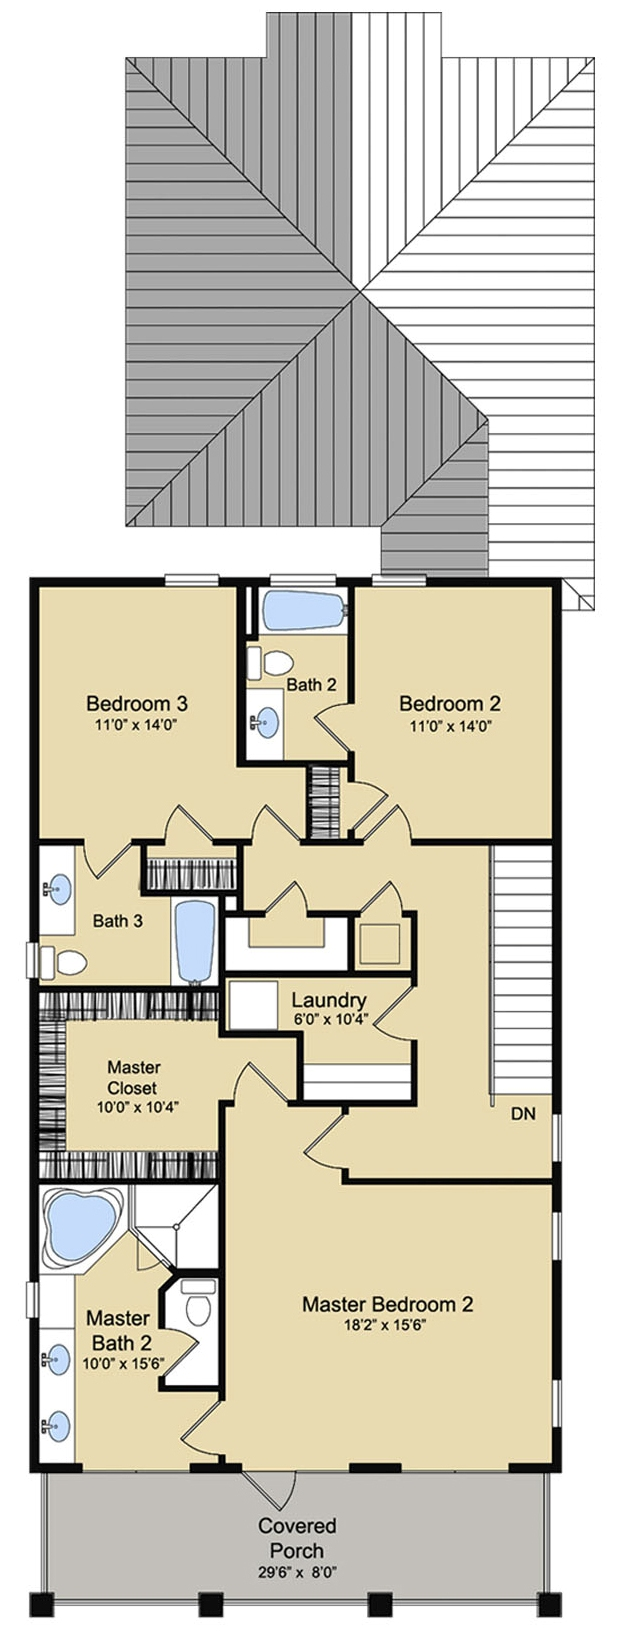 Coastal house plan 142 1125 4 bedrm 2888 sq ft home for 1125 sq ft floor plan